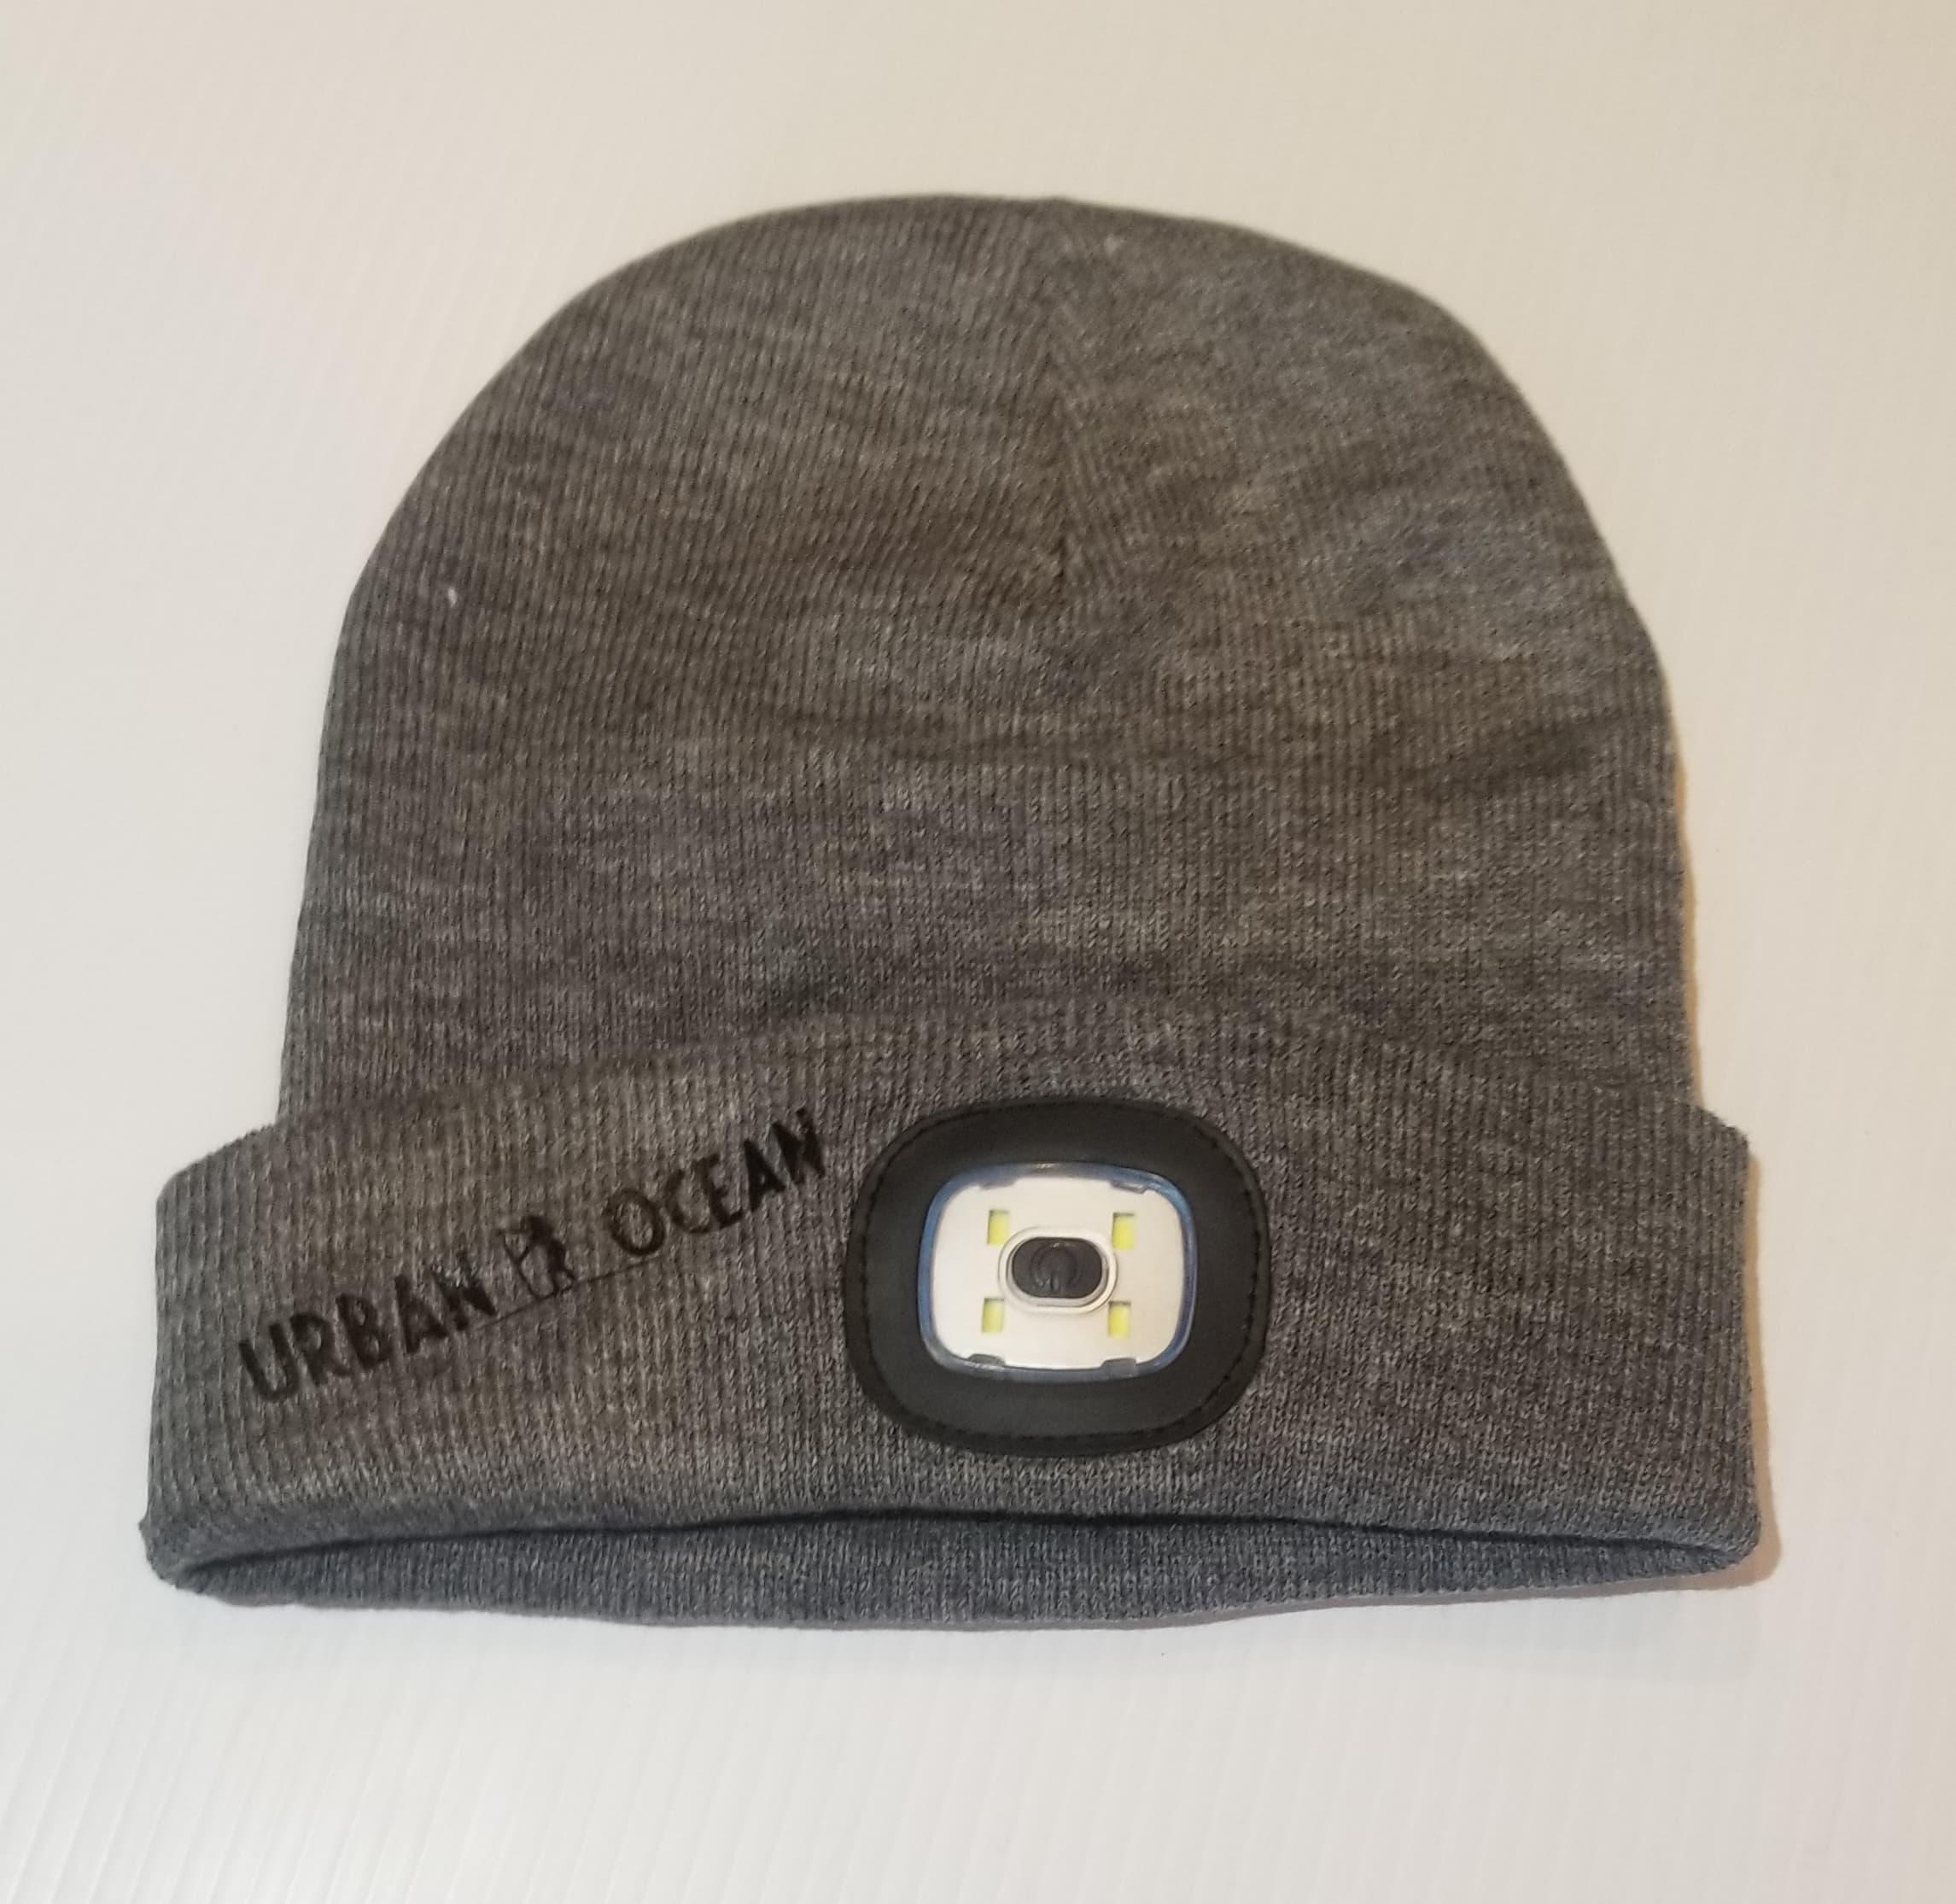 Grey/Black Winter SUP Light Hat